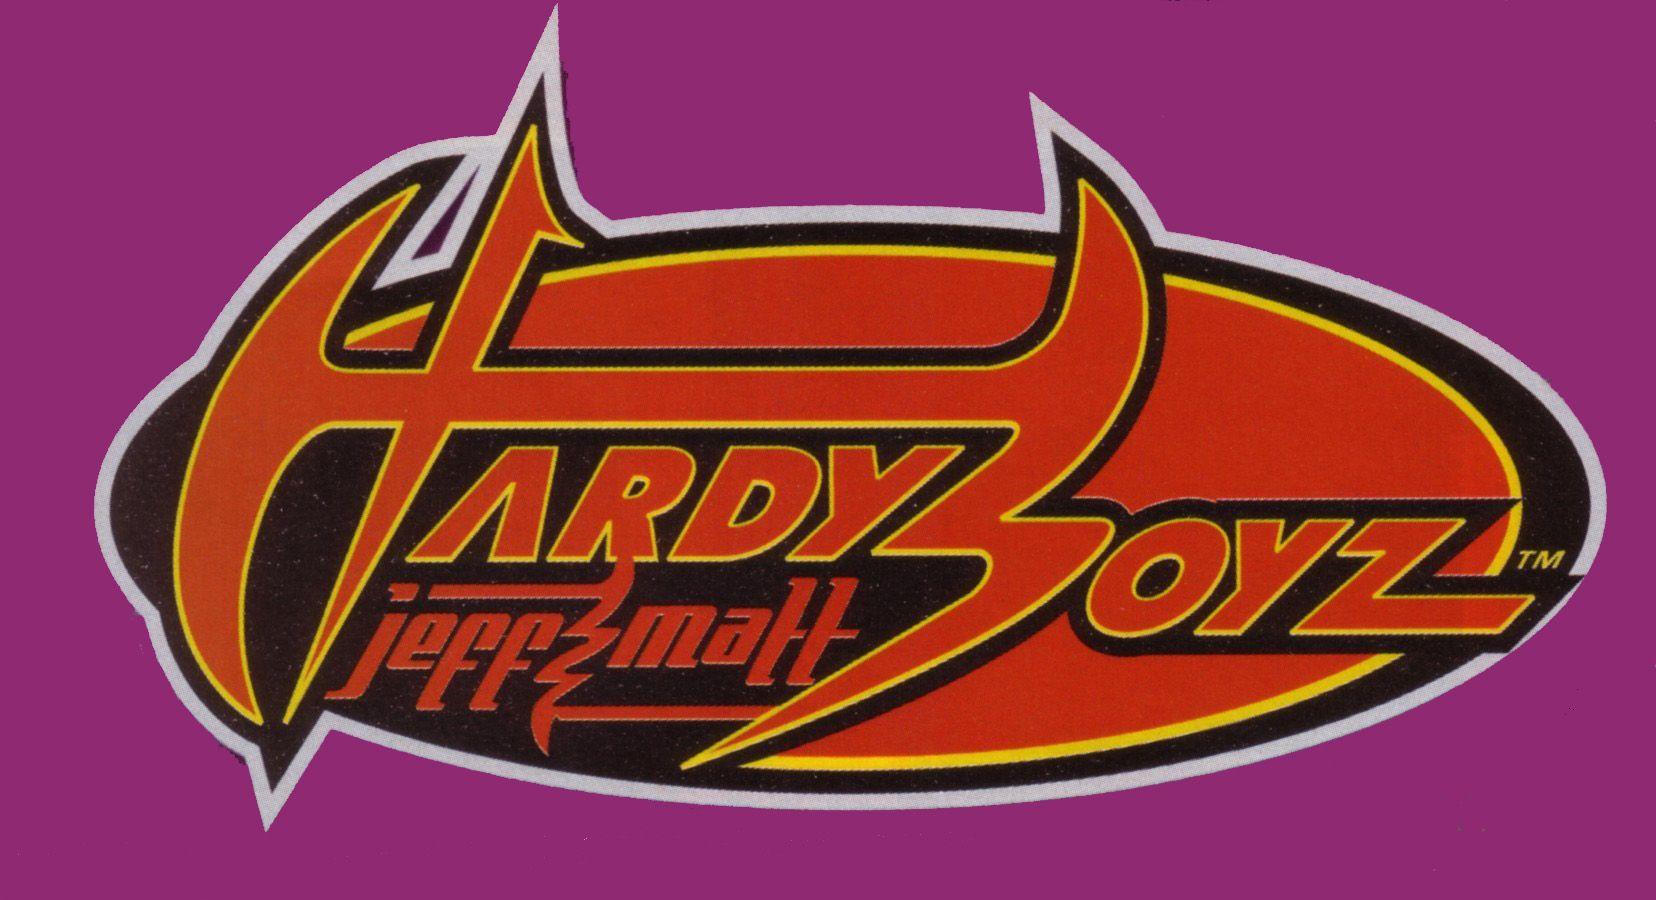 The Hardy Boyz Matt Jeff Logo 3 Wwe